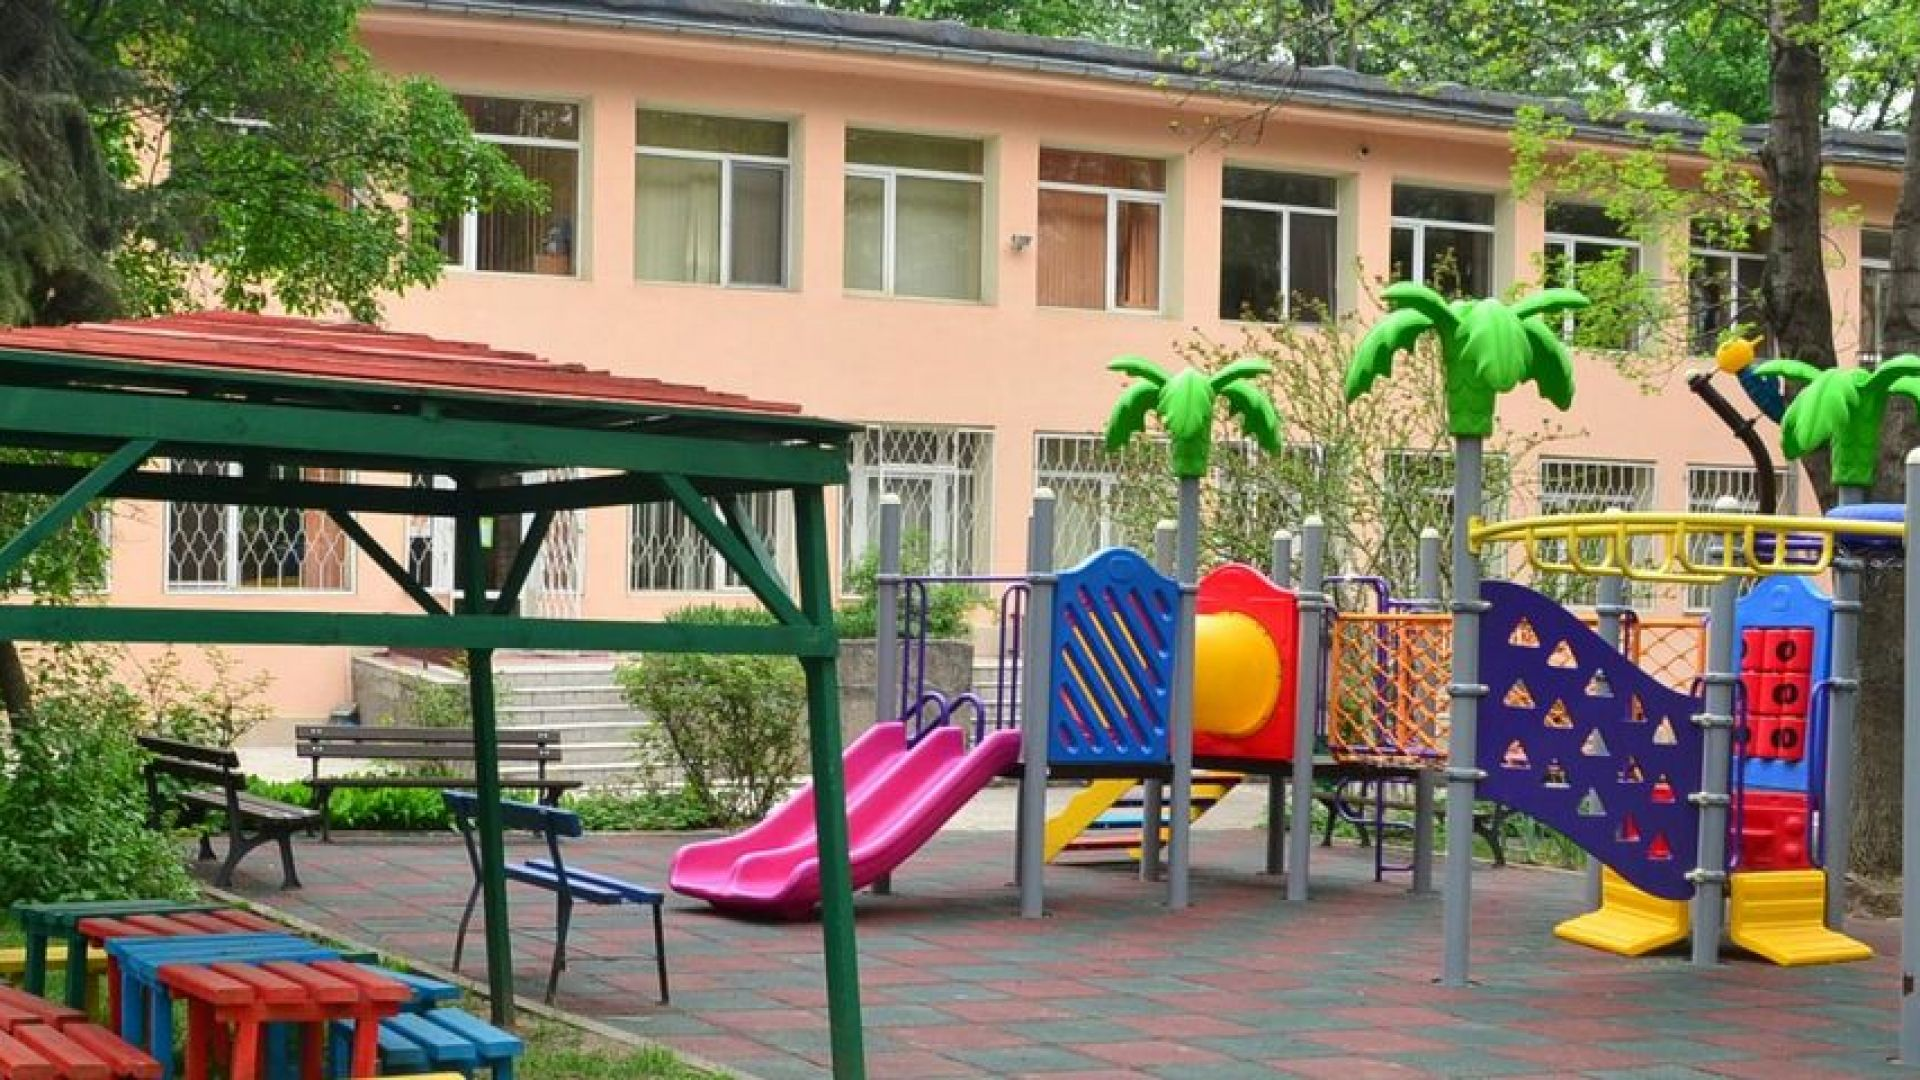 176 детски градини в София отварят врати с 26% посещаемост